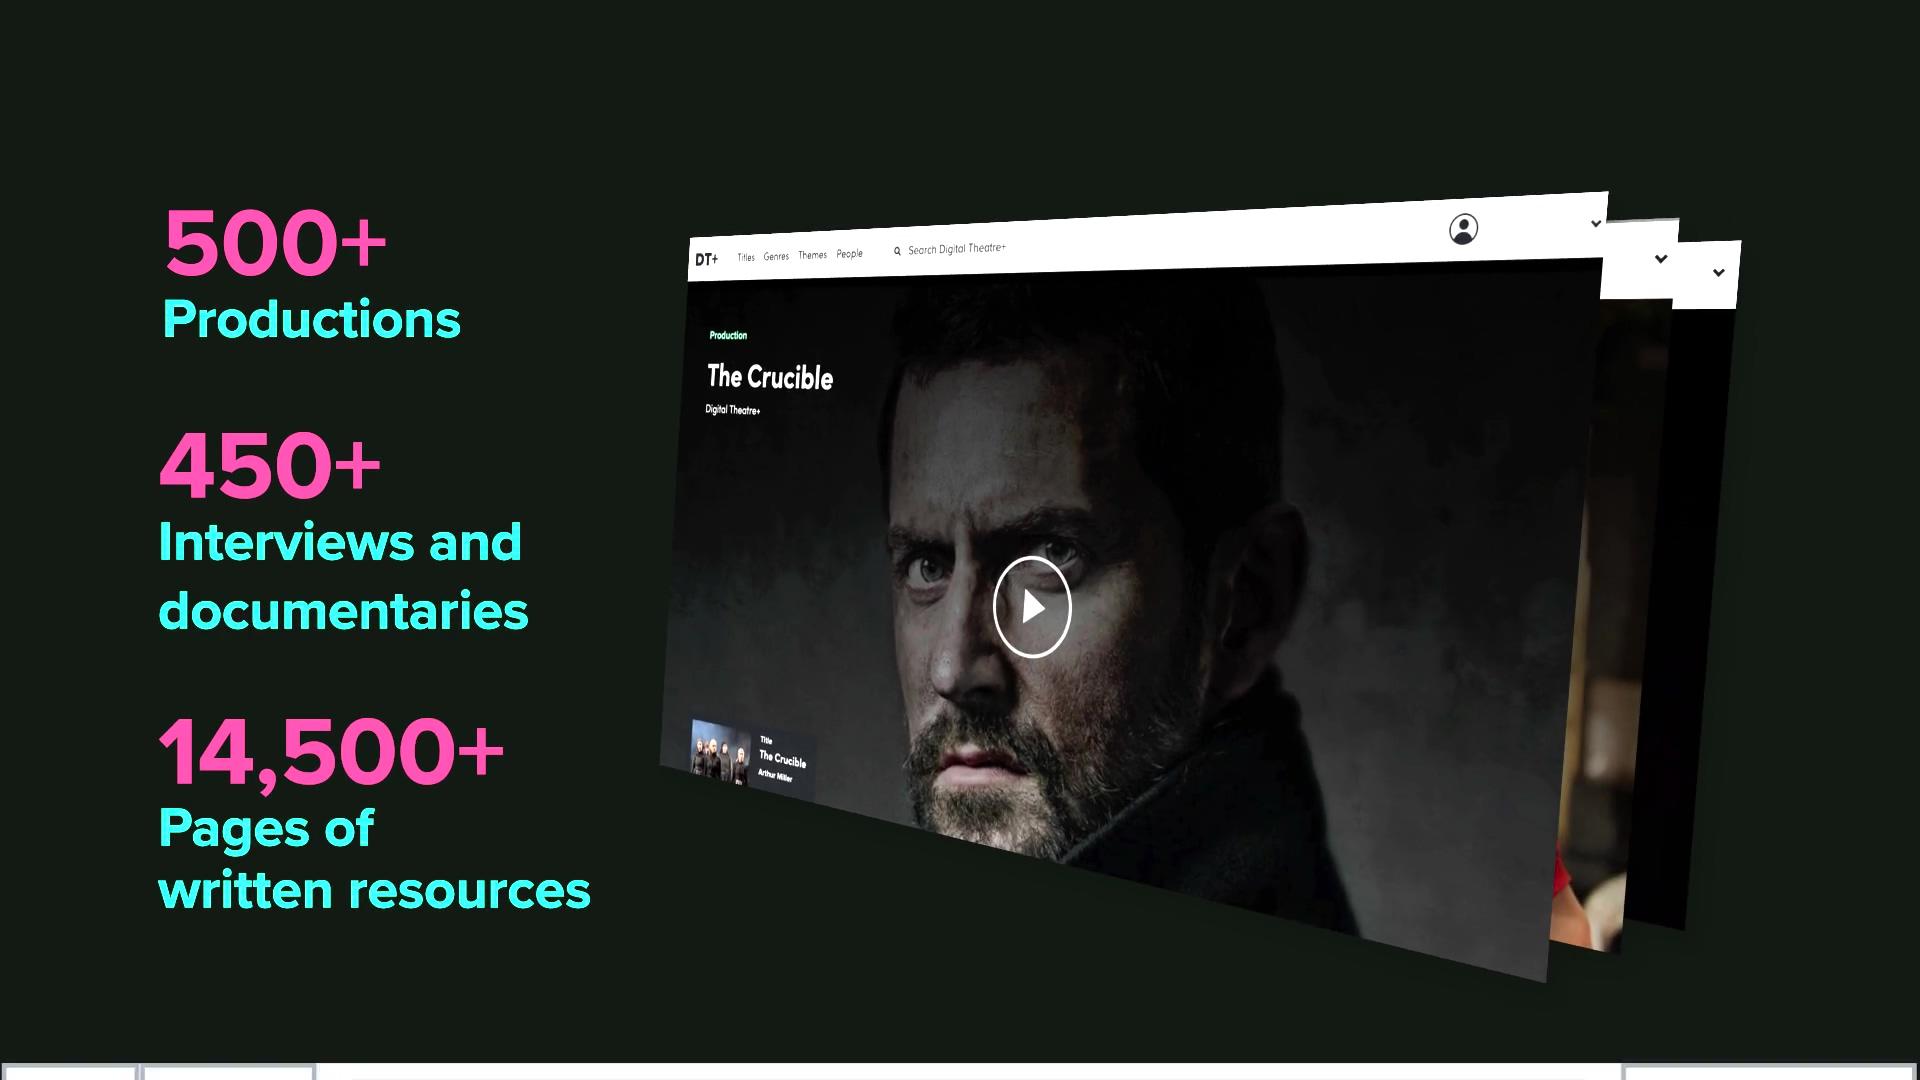 Digital_Theatre_Plus_Captions_with_url-1